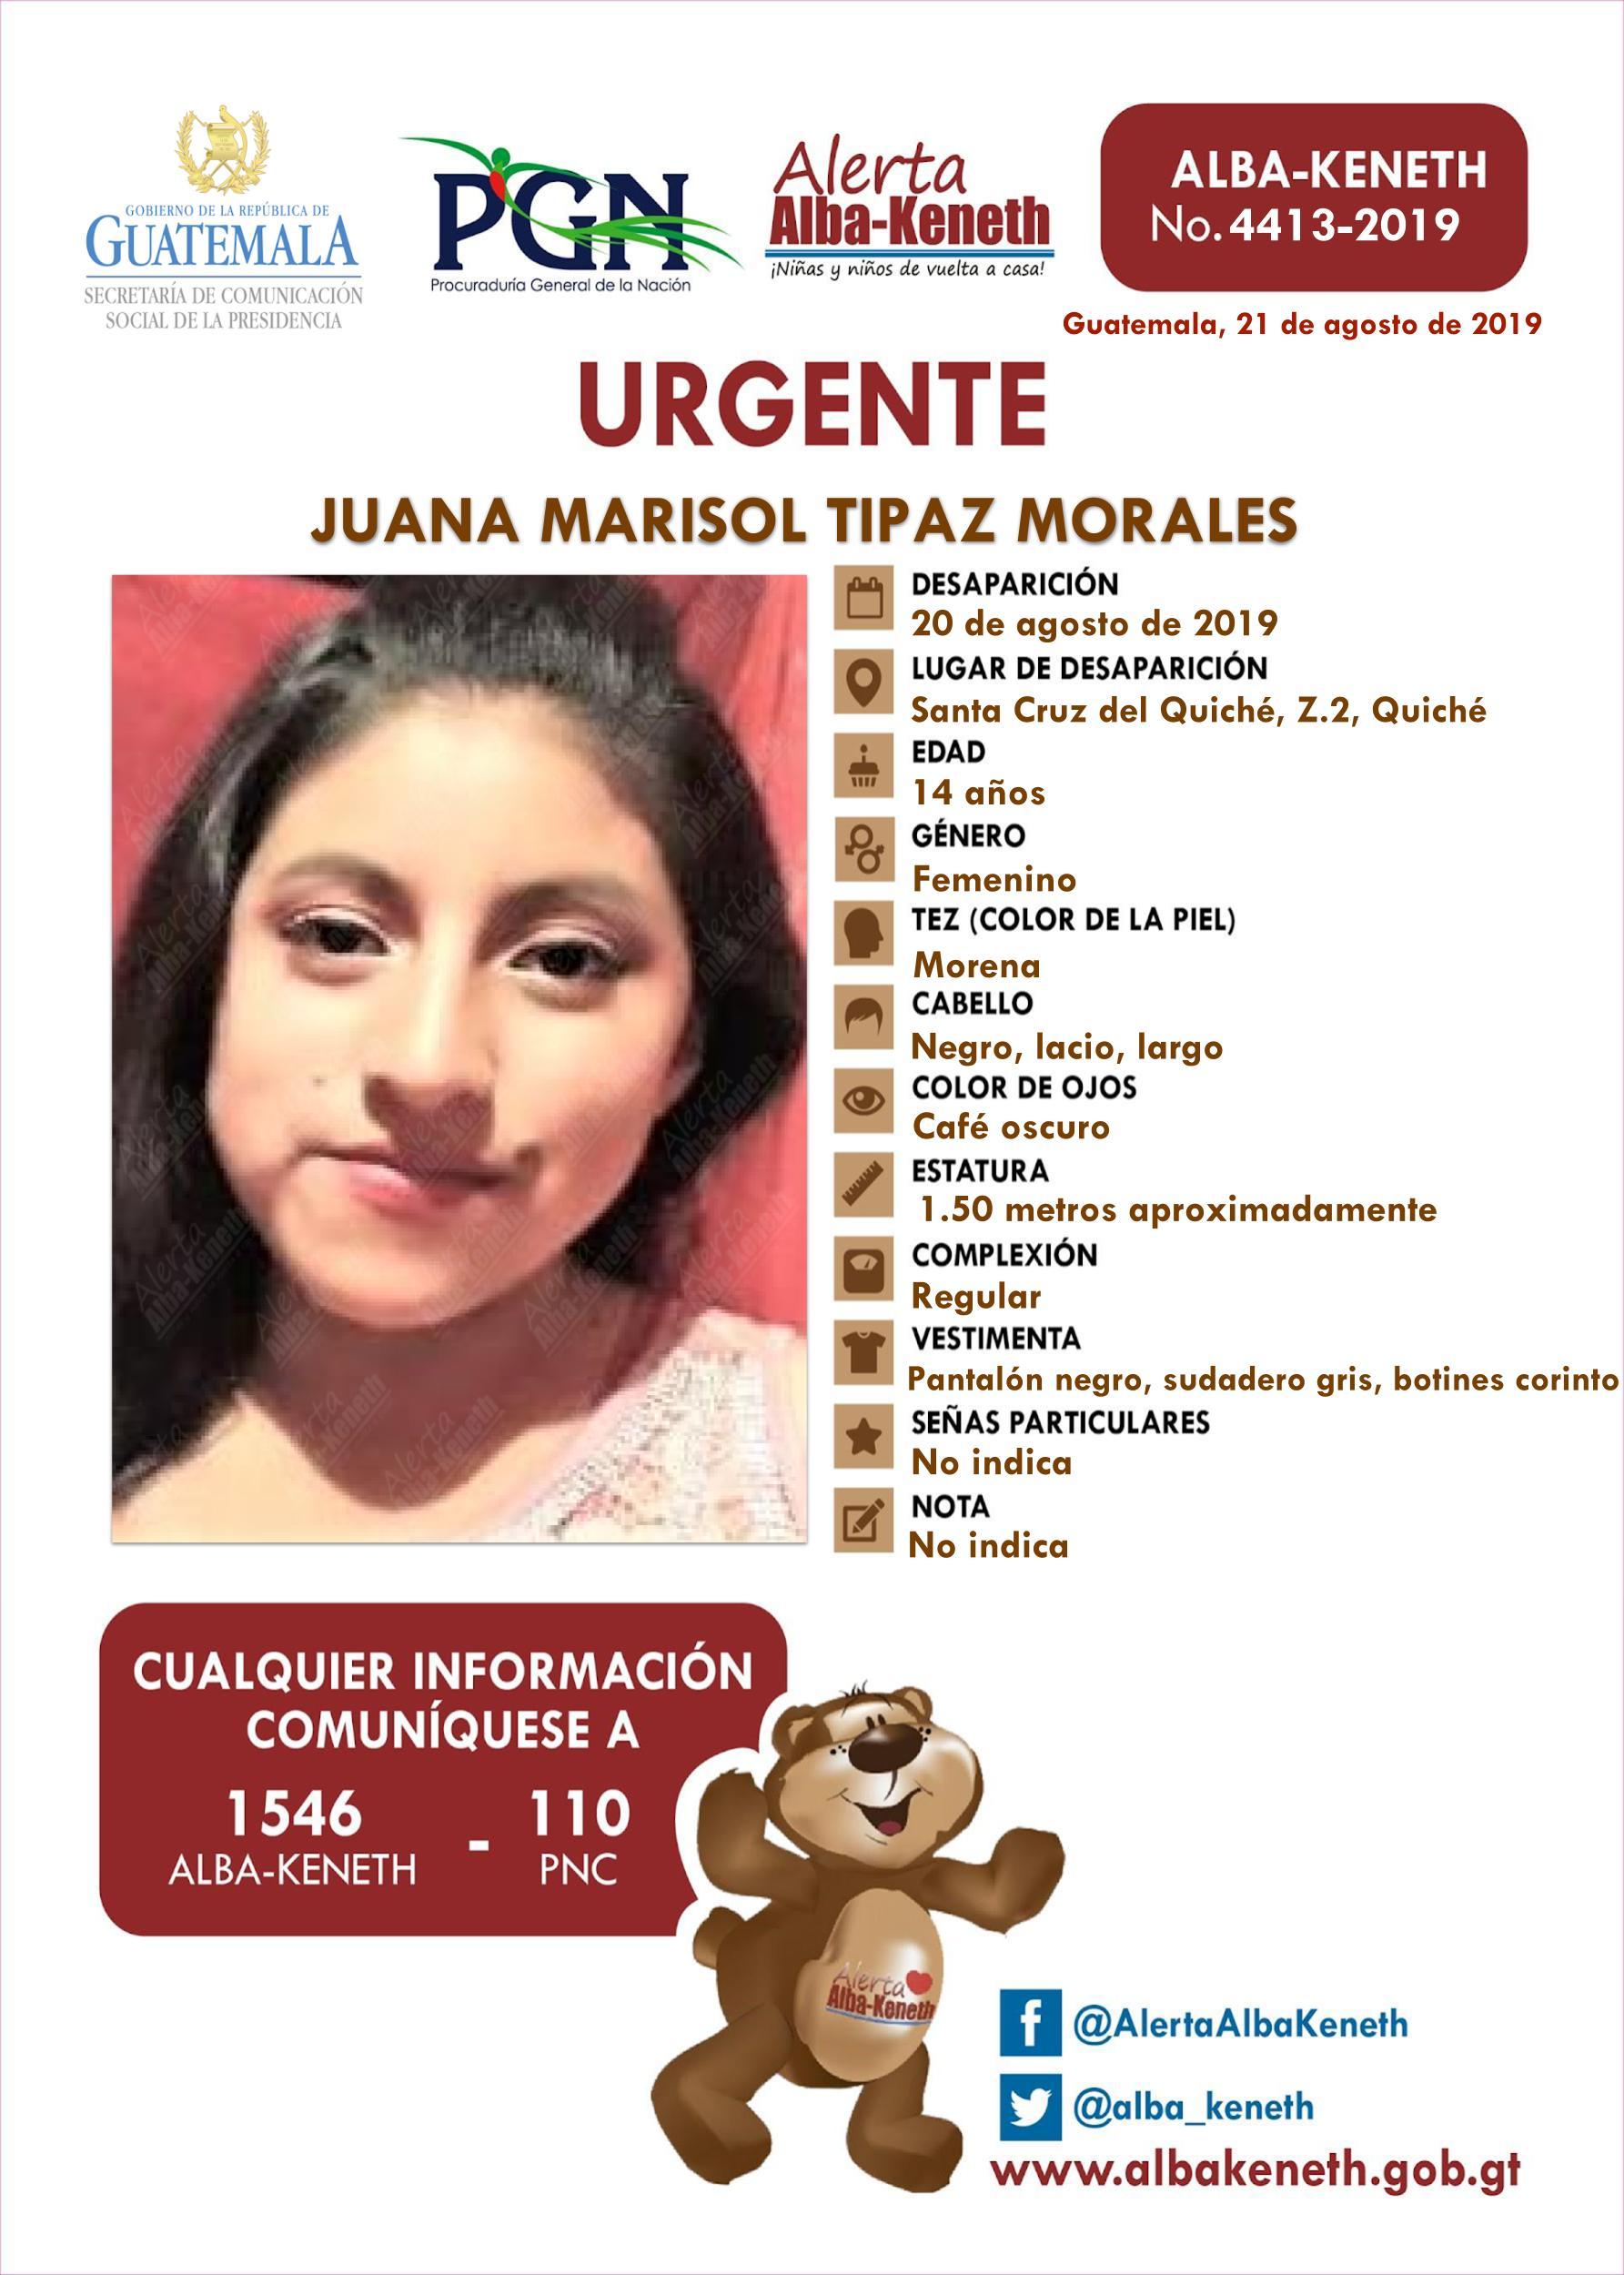 Juana Marisol Tipaz Morales